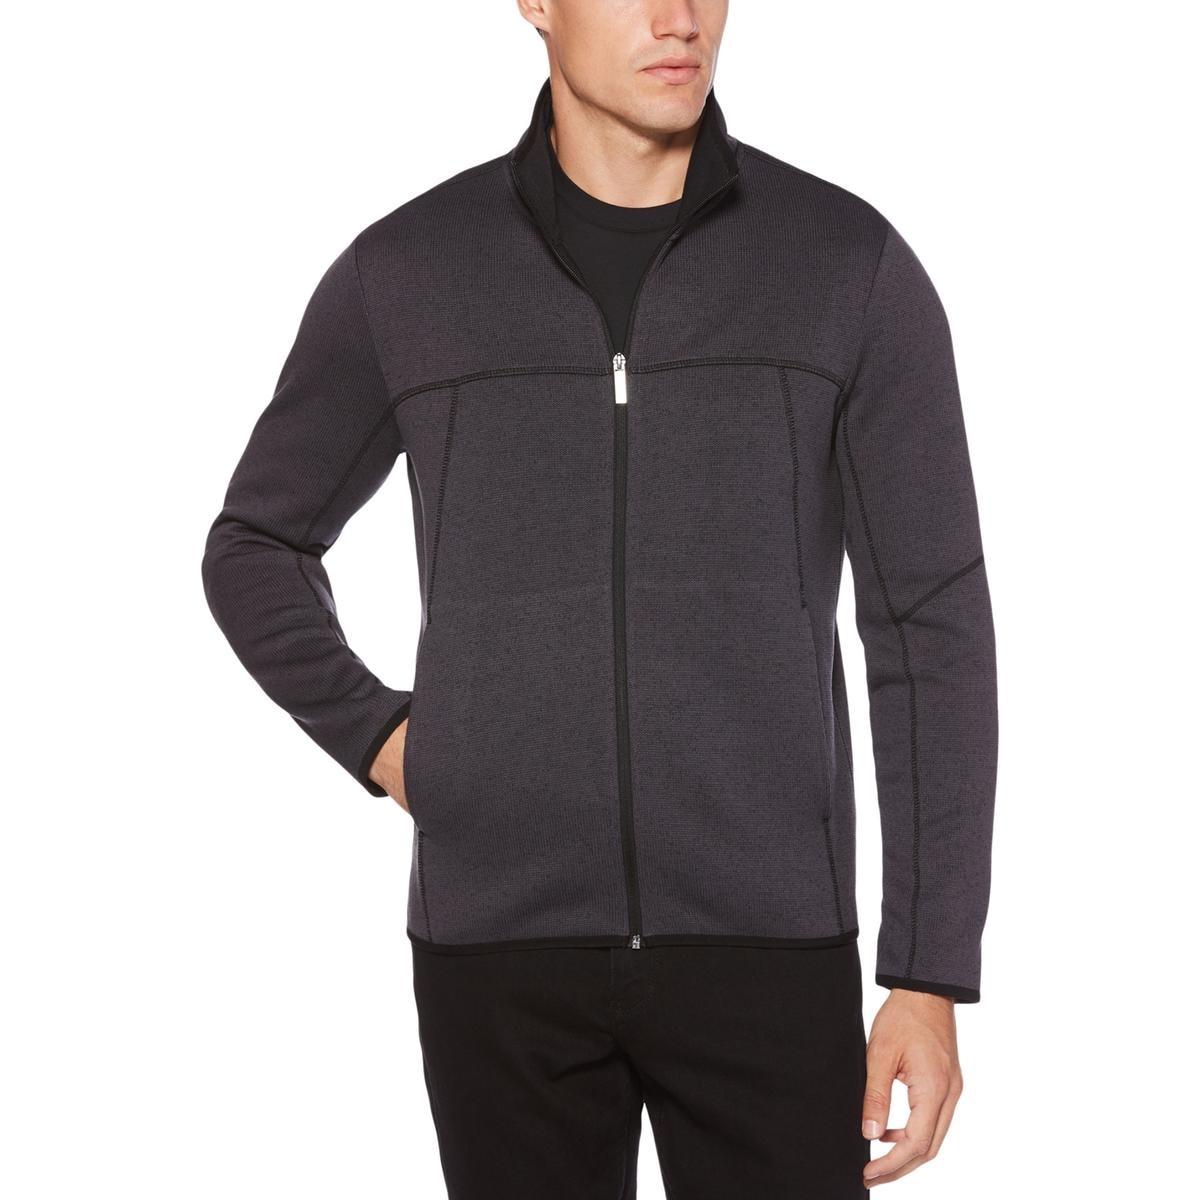 ba79686eaf Shop Perry Ellis Mens Full Zip Sweater Fleece Warm - XxL - Free Shipping On  Orders Over  45 - Overstock.com - 25604424